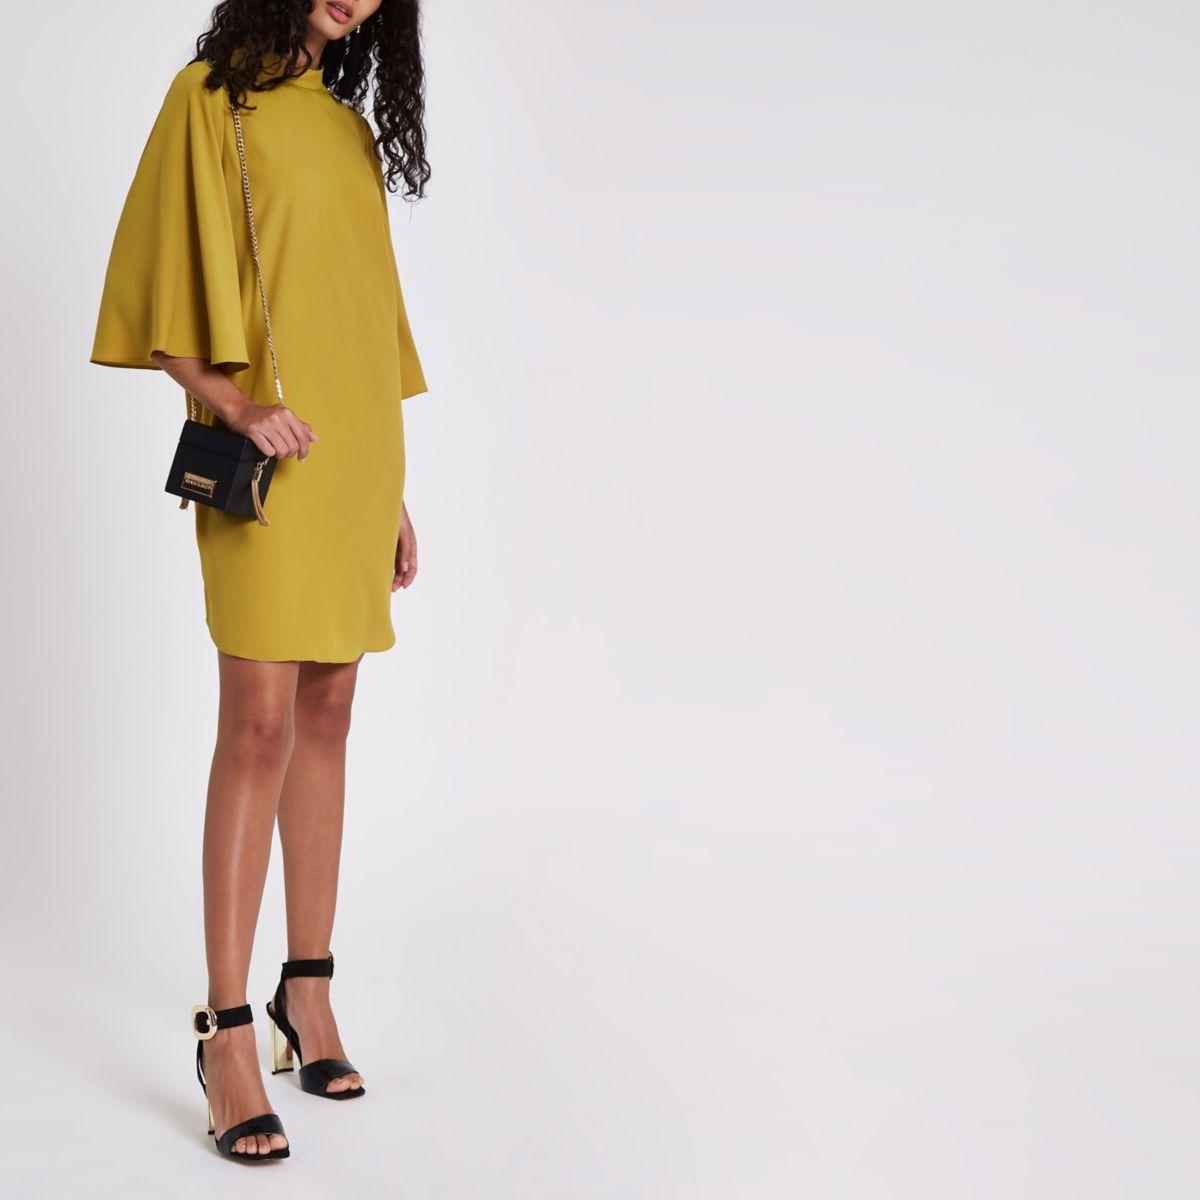 Yellow button shoulder swing dress